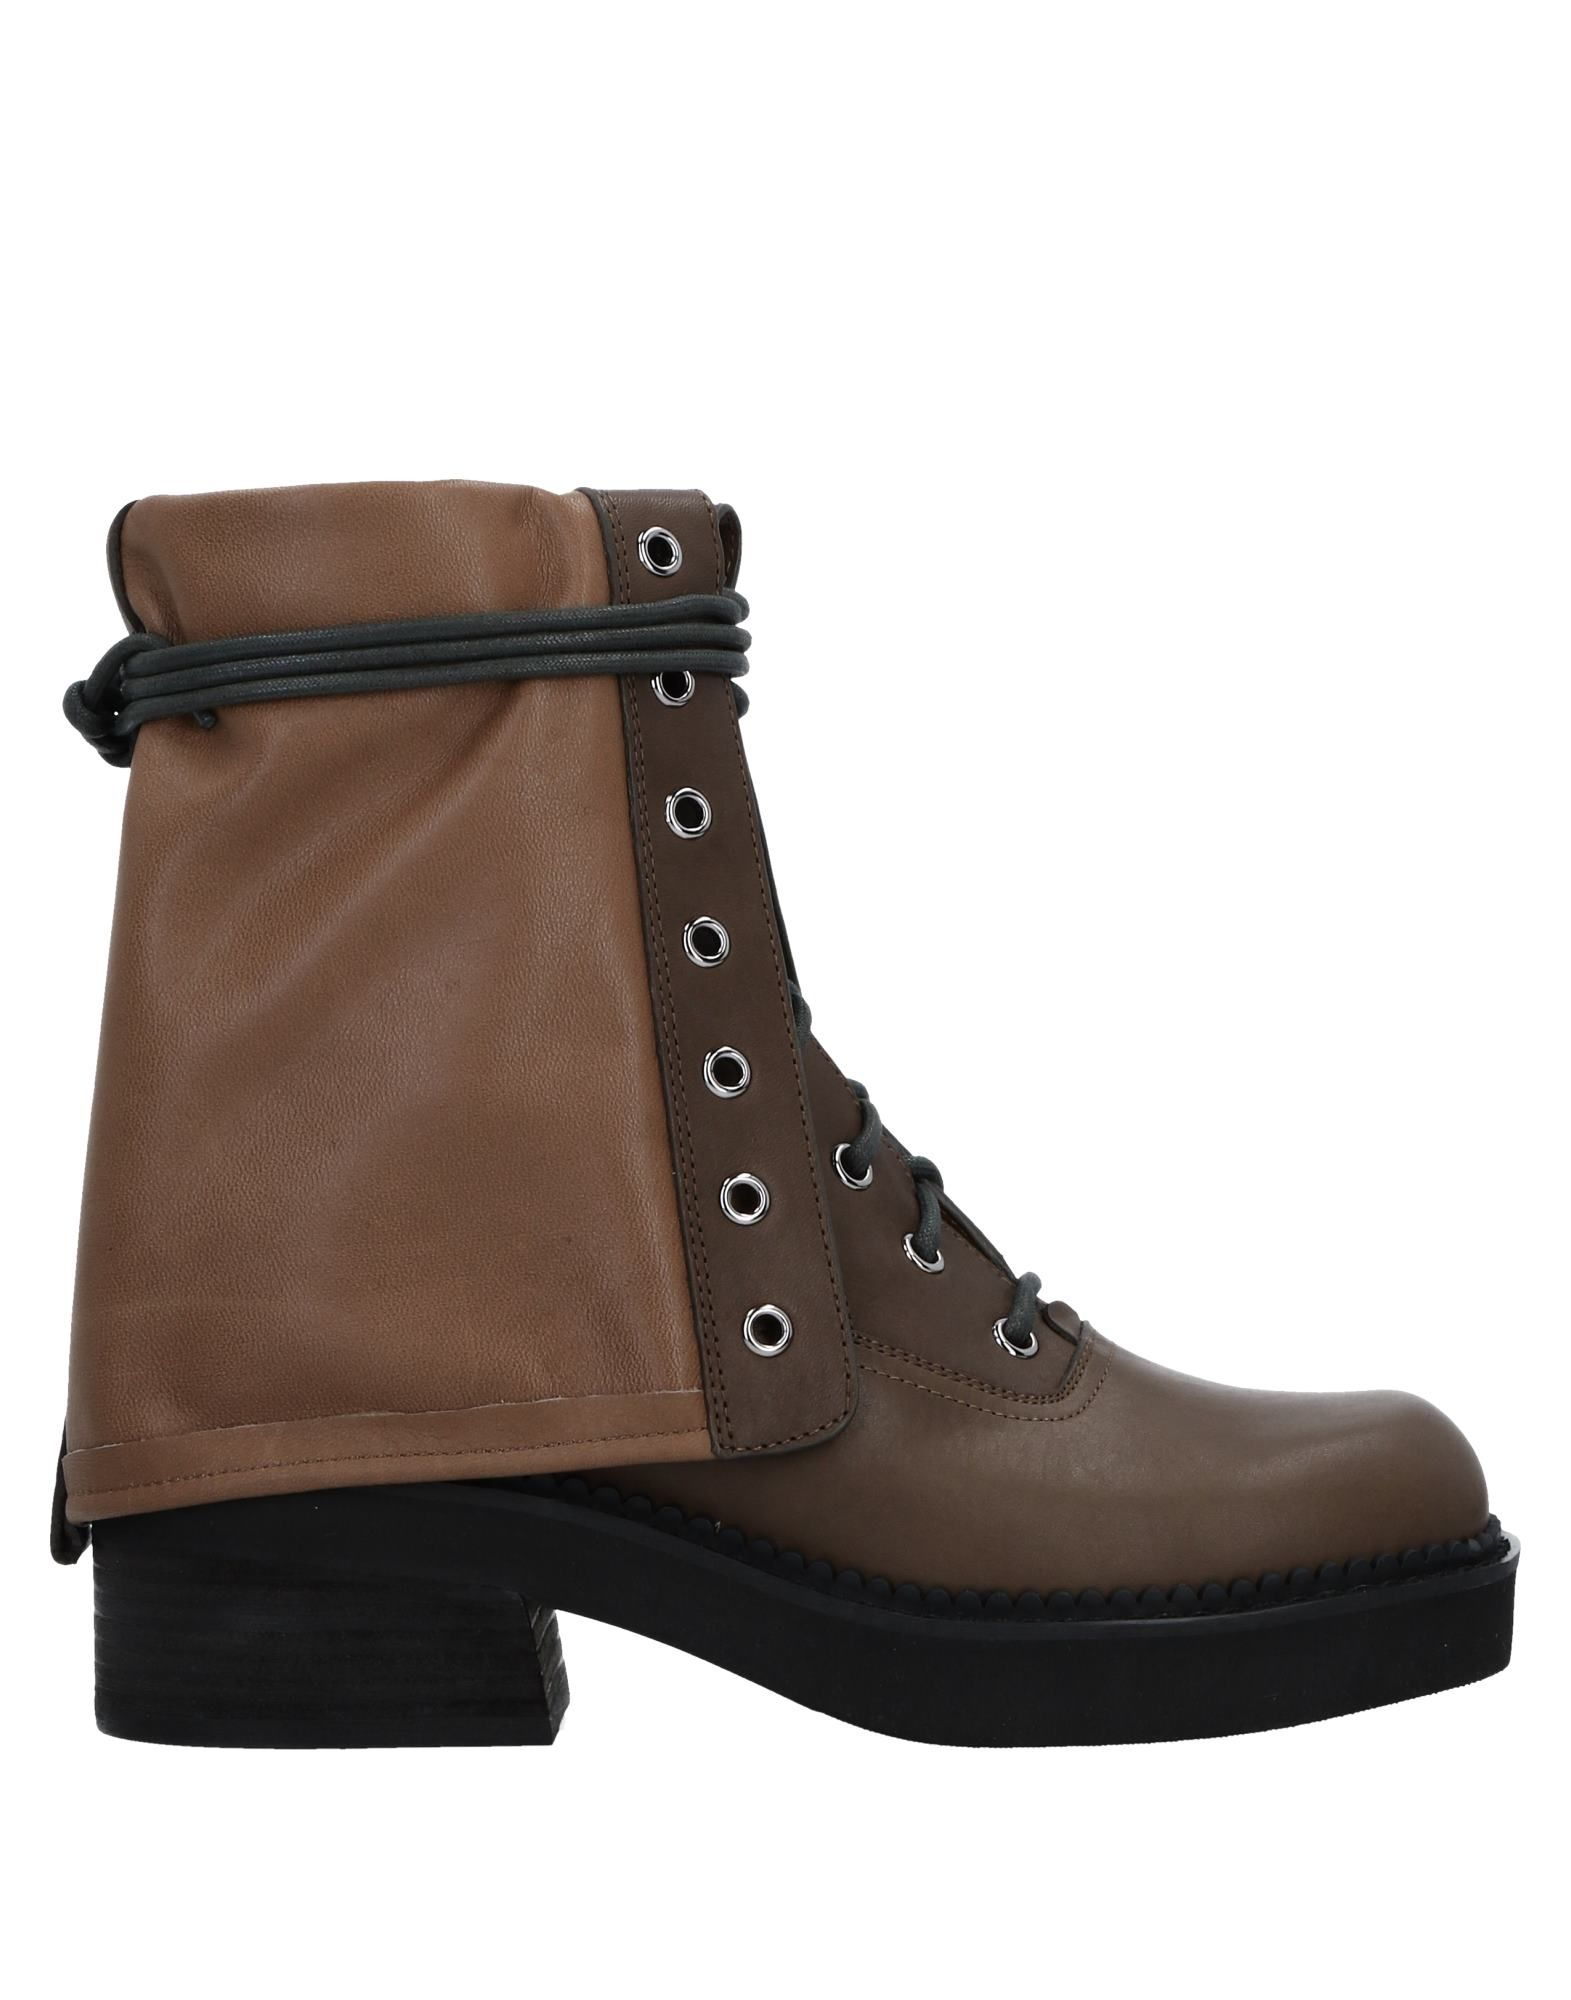 Rabatt Schuhe See By Chloé Damen Stiefelette Damen Chloé 11539711OA a0651d